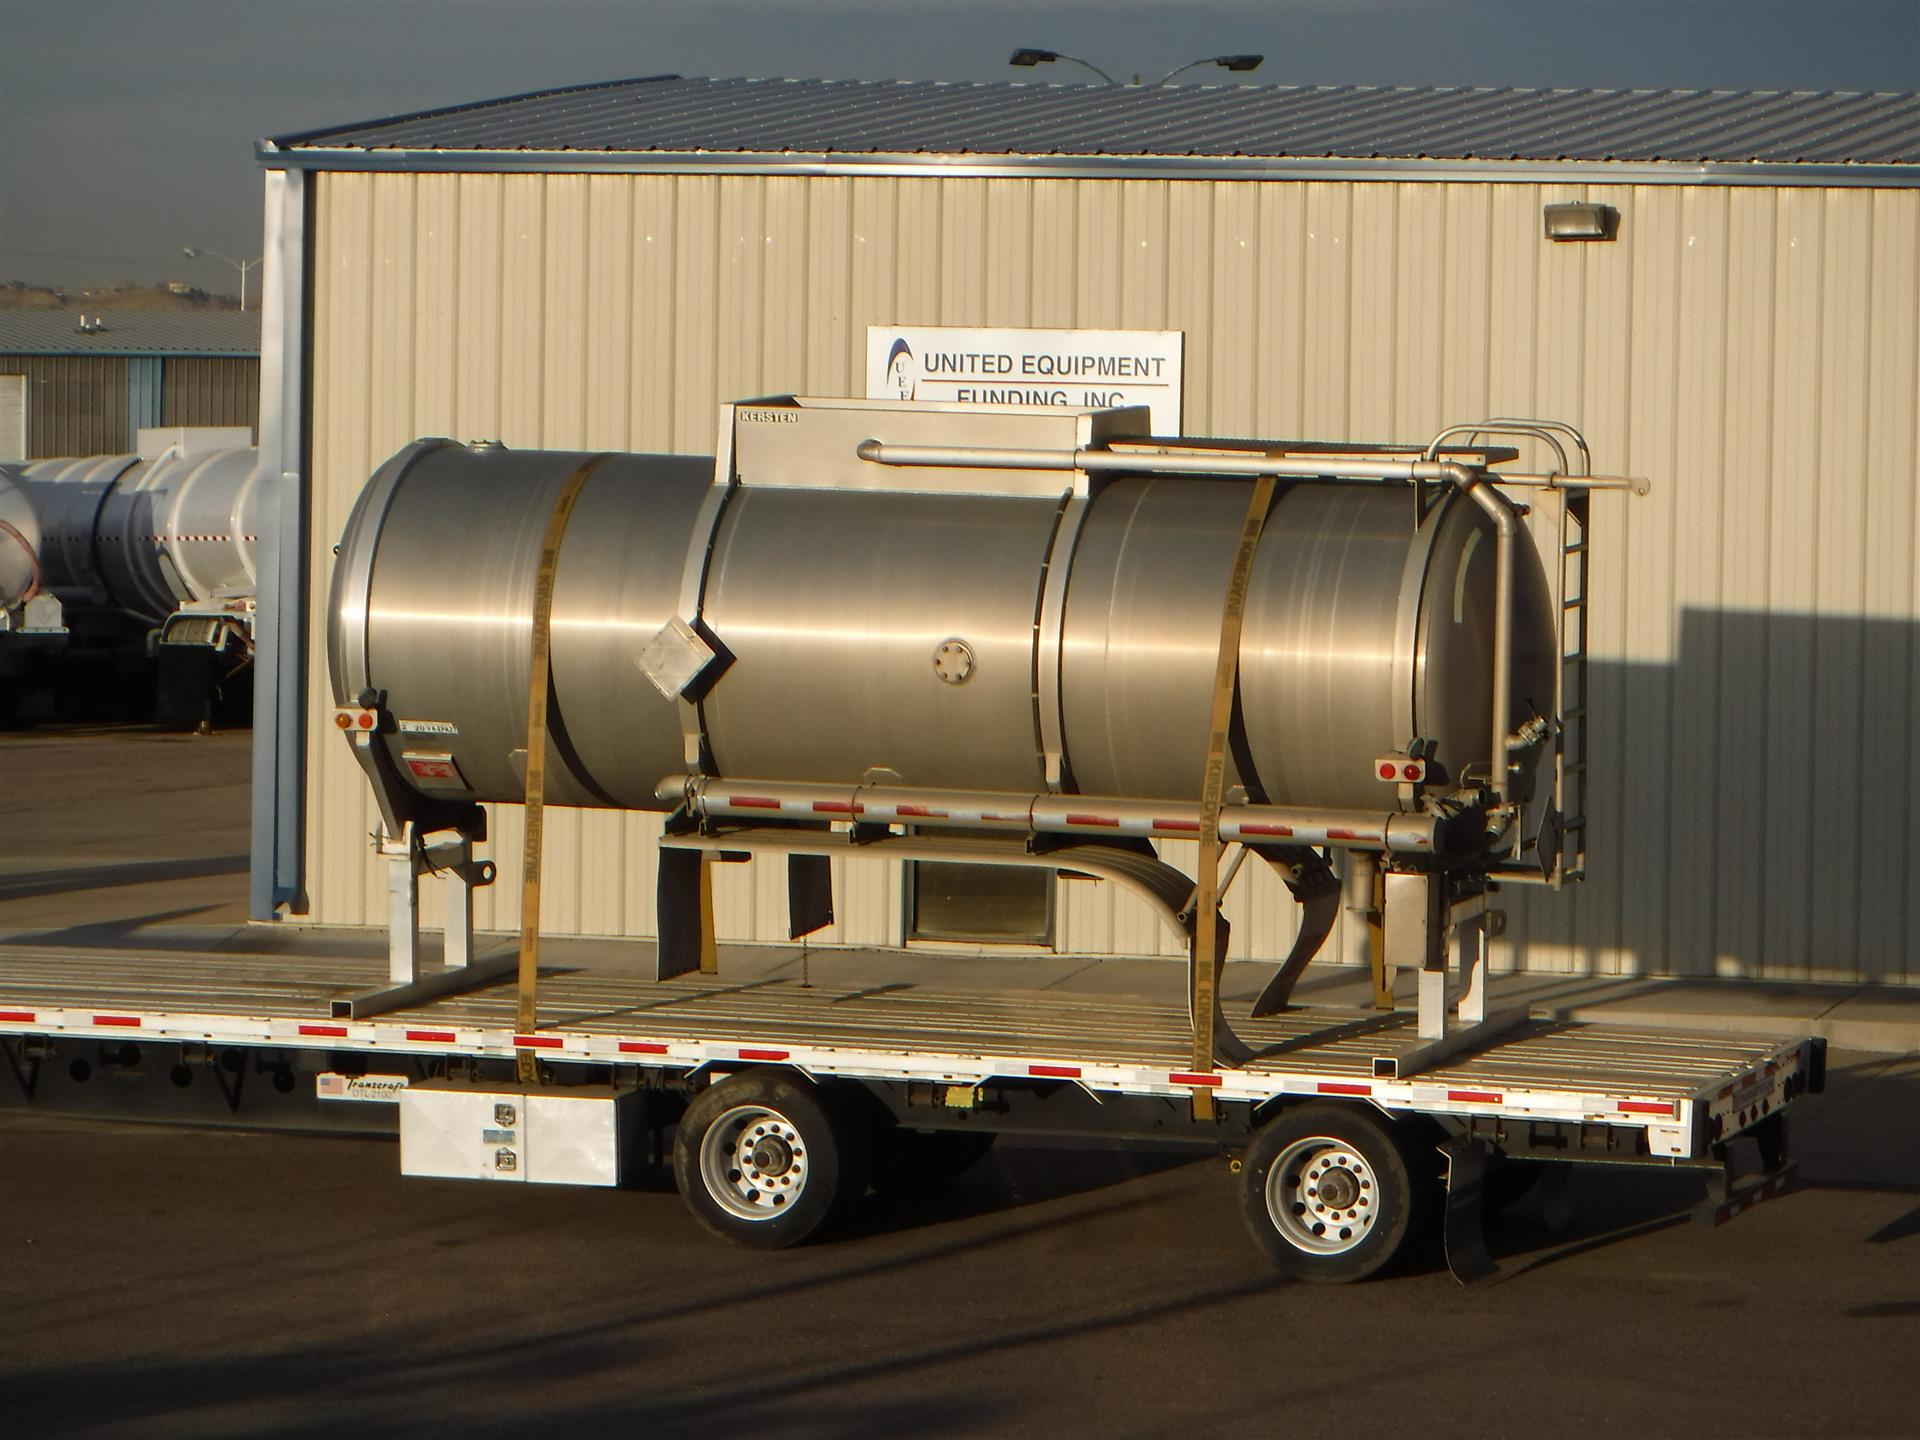 2012 Kersten MC407 Crude Oil Body Tank